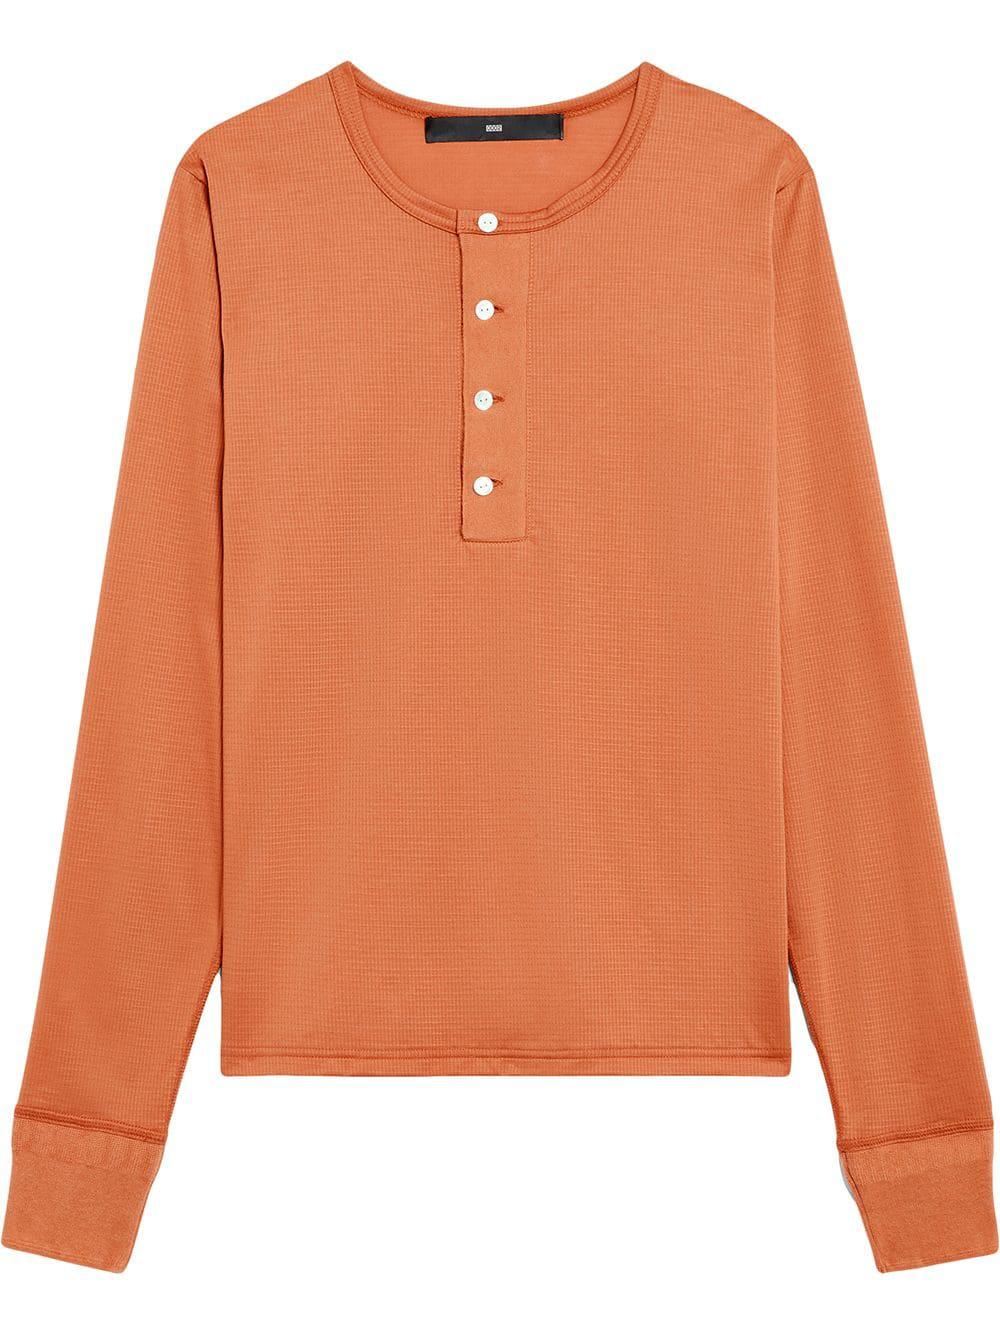 864eb04f2e9 Mackintosh 0003 Amber Cotton 0003 Henley Shirt - Neutrals | ModeSens